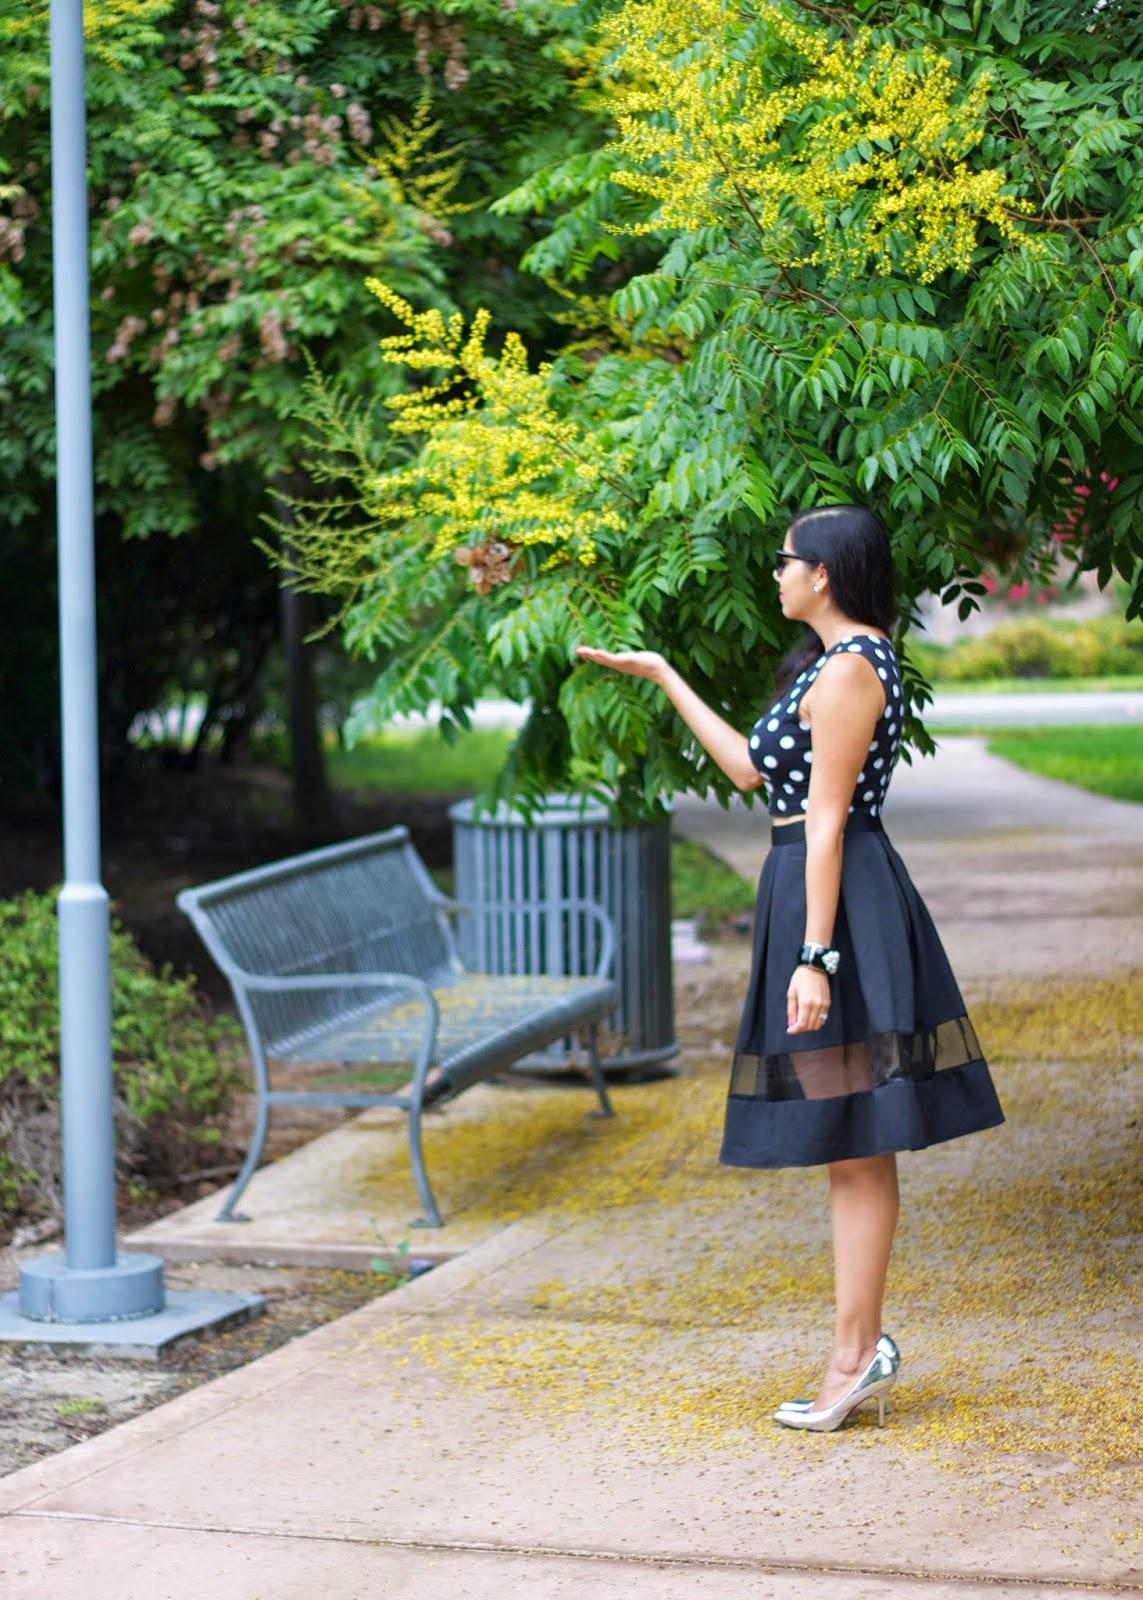 socal fashion blogger, california blogger, la blogger, midi skirt from express, how to wear a midi skirt, polka dot crop top, forever 21 polka dot crop top